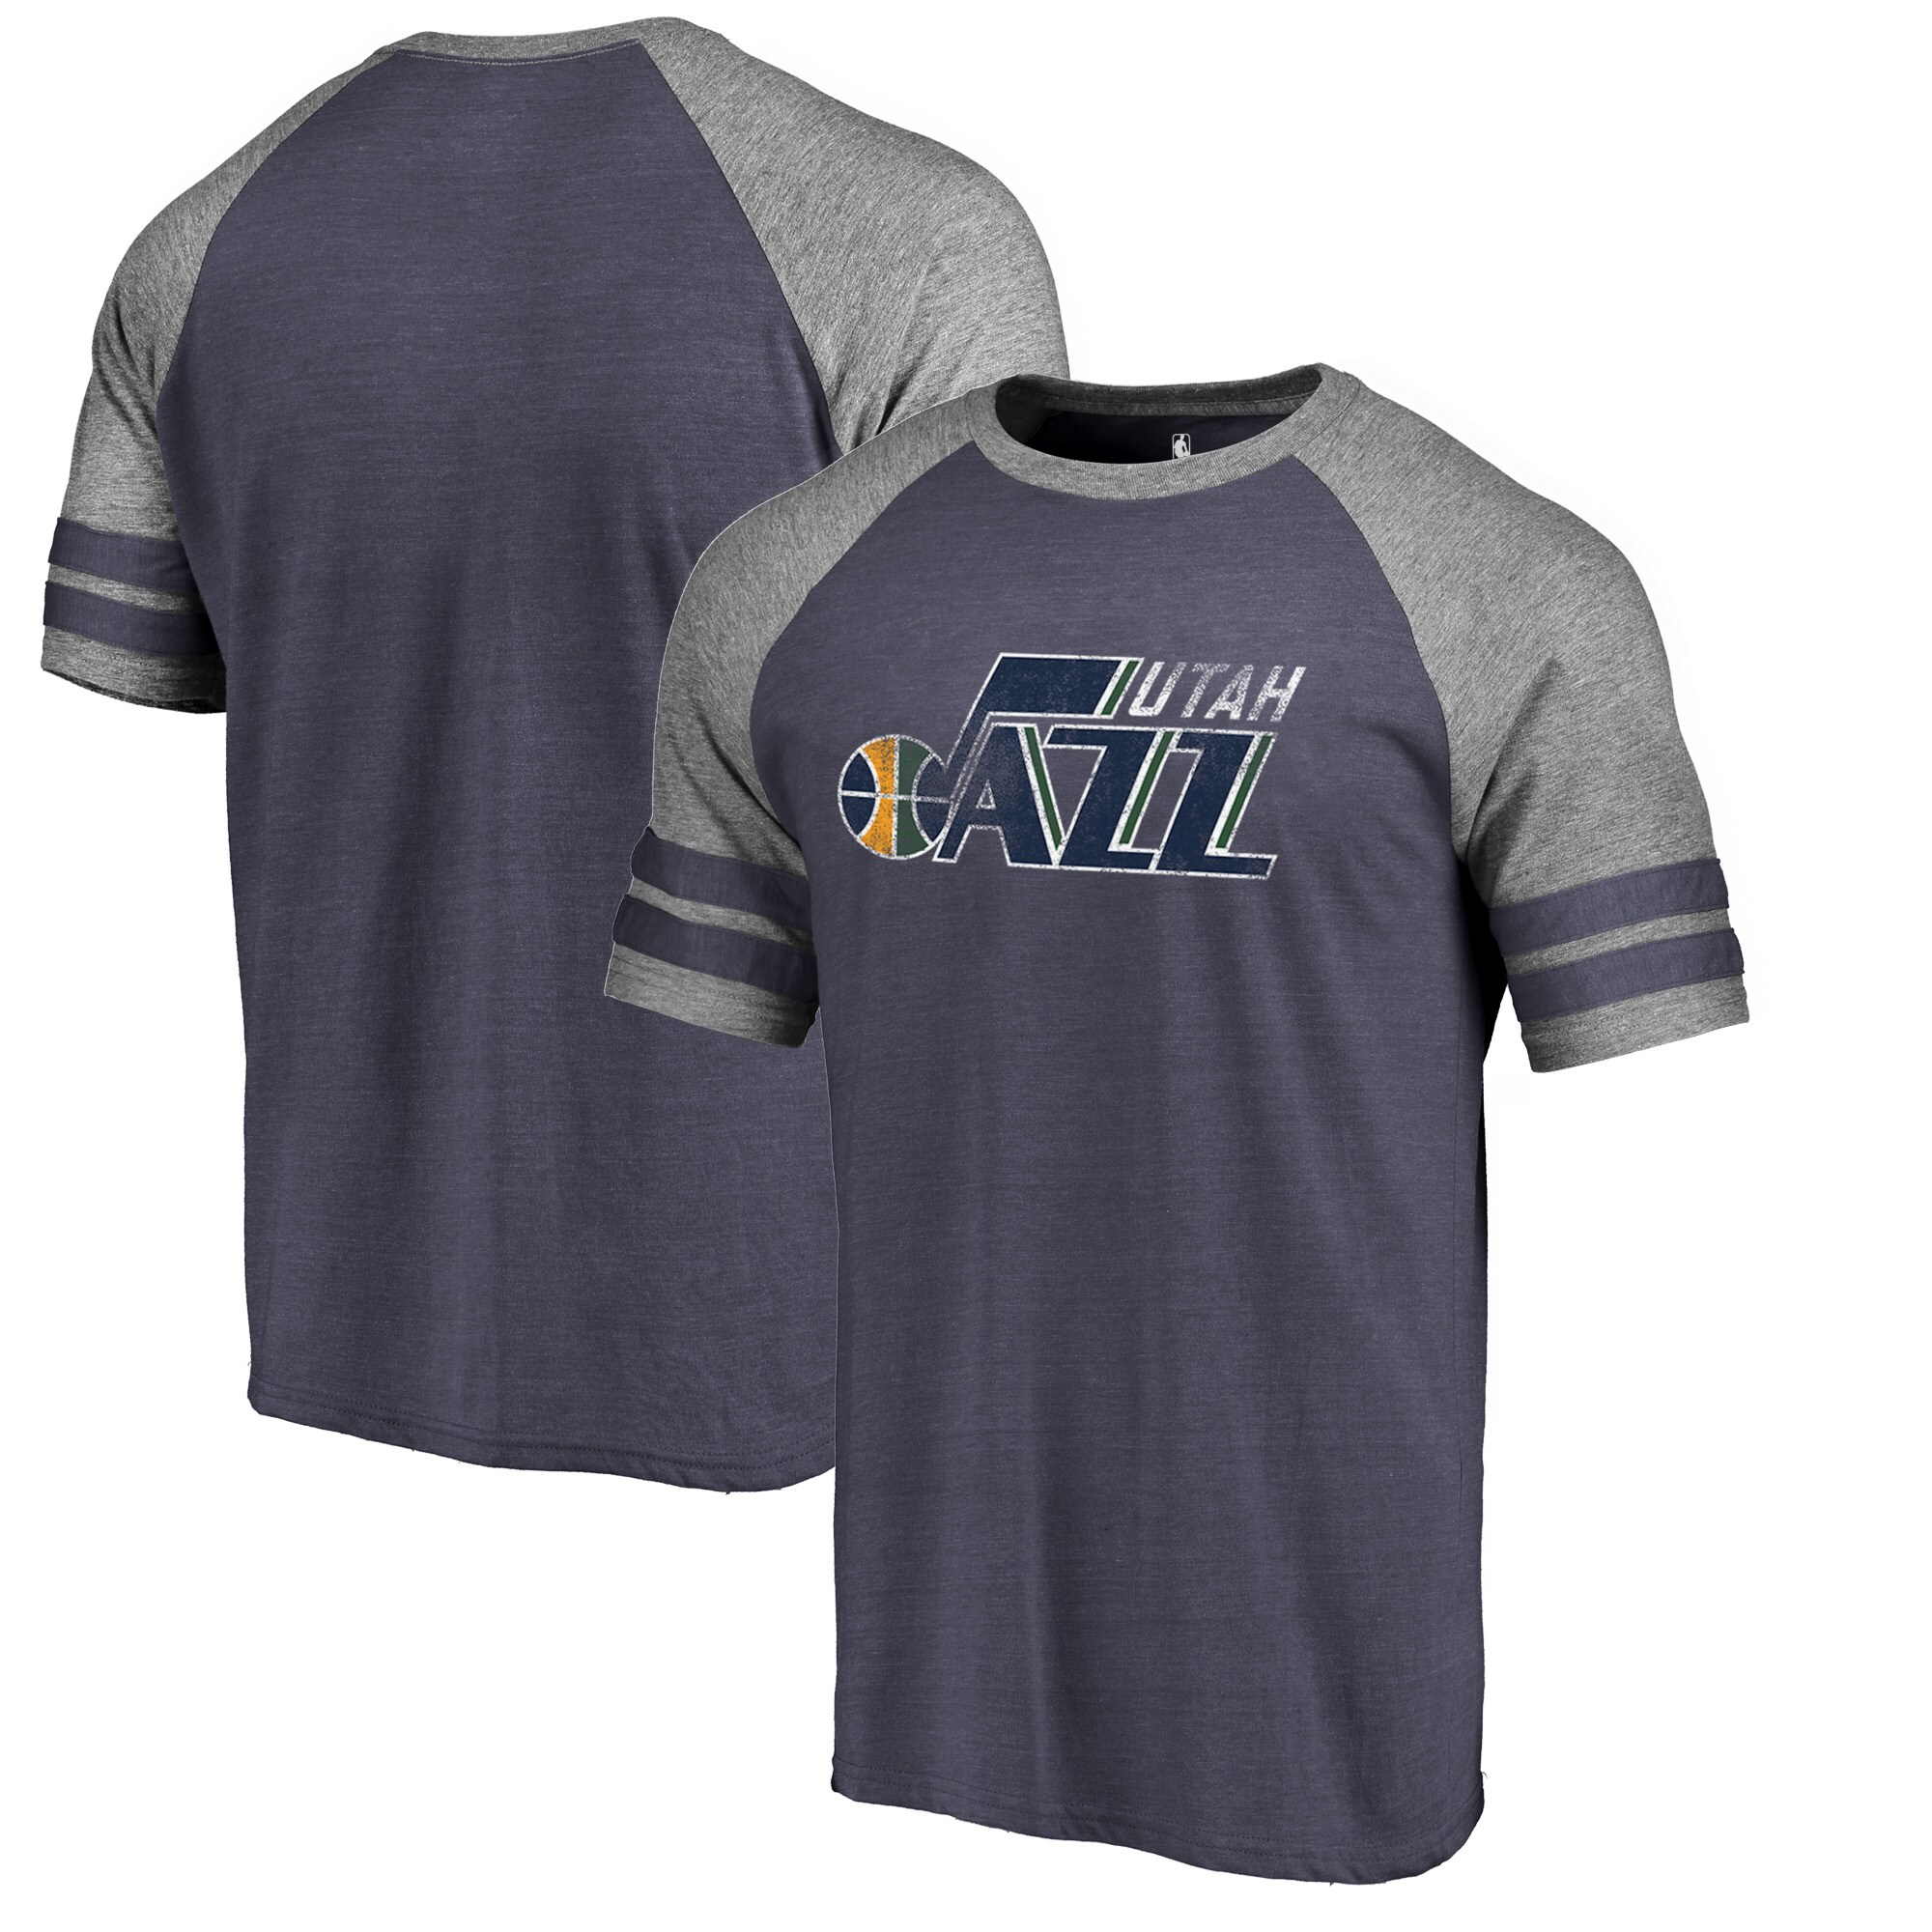 Utah Jazz Fanatics Branded Distressed Logo Raglan Tri-Blend T-Shirt - Navy